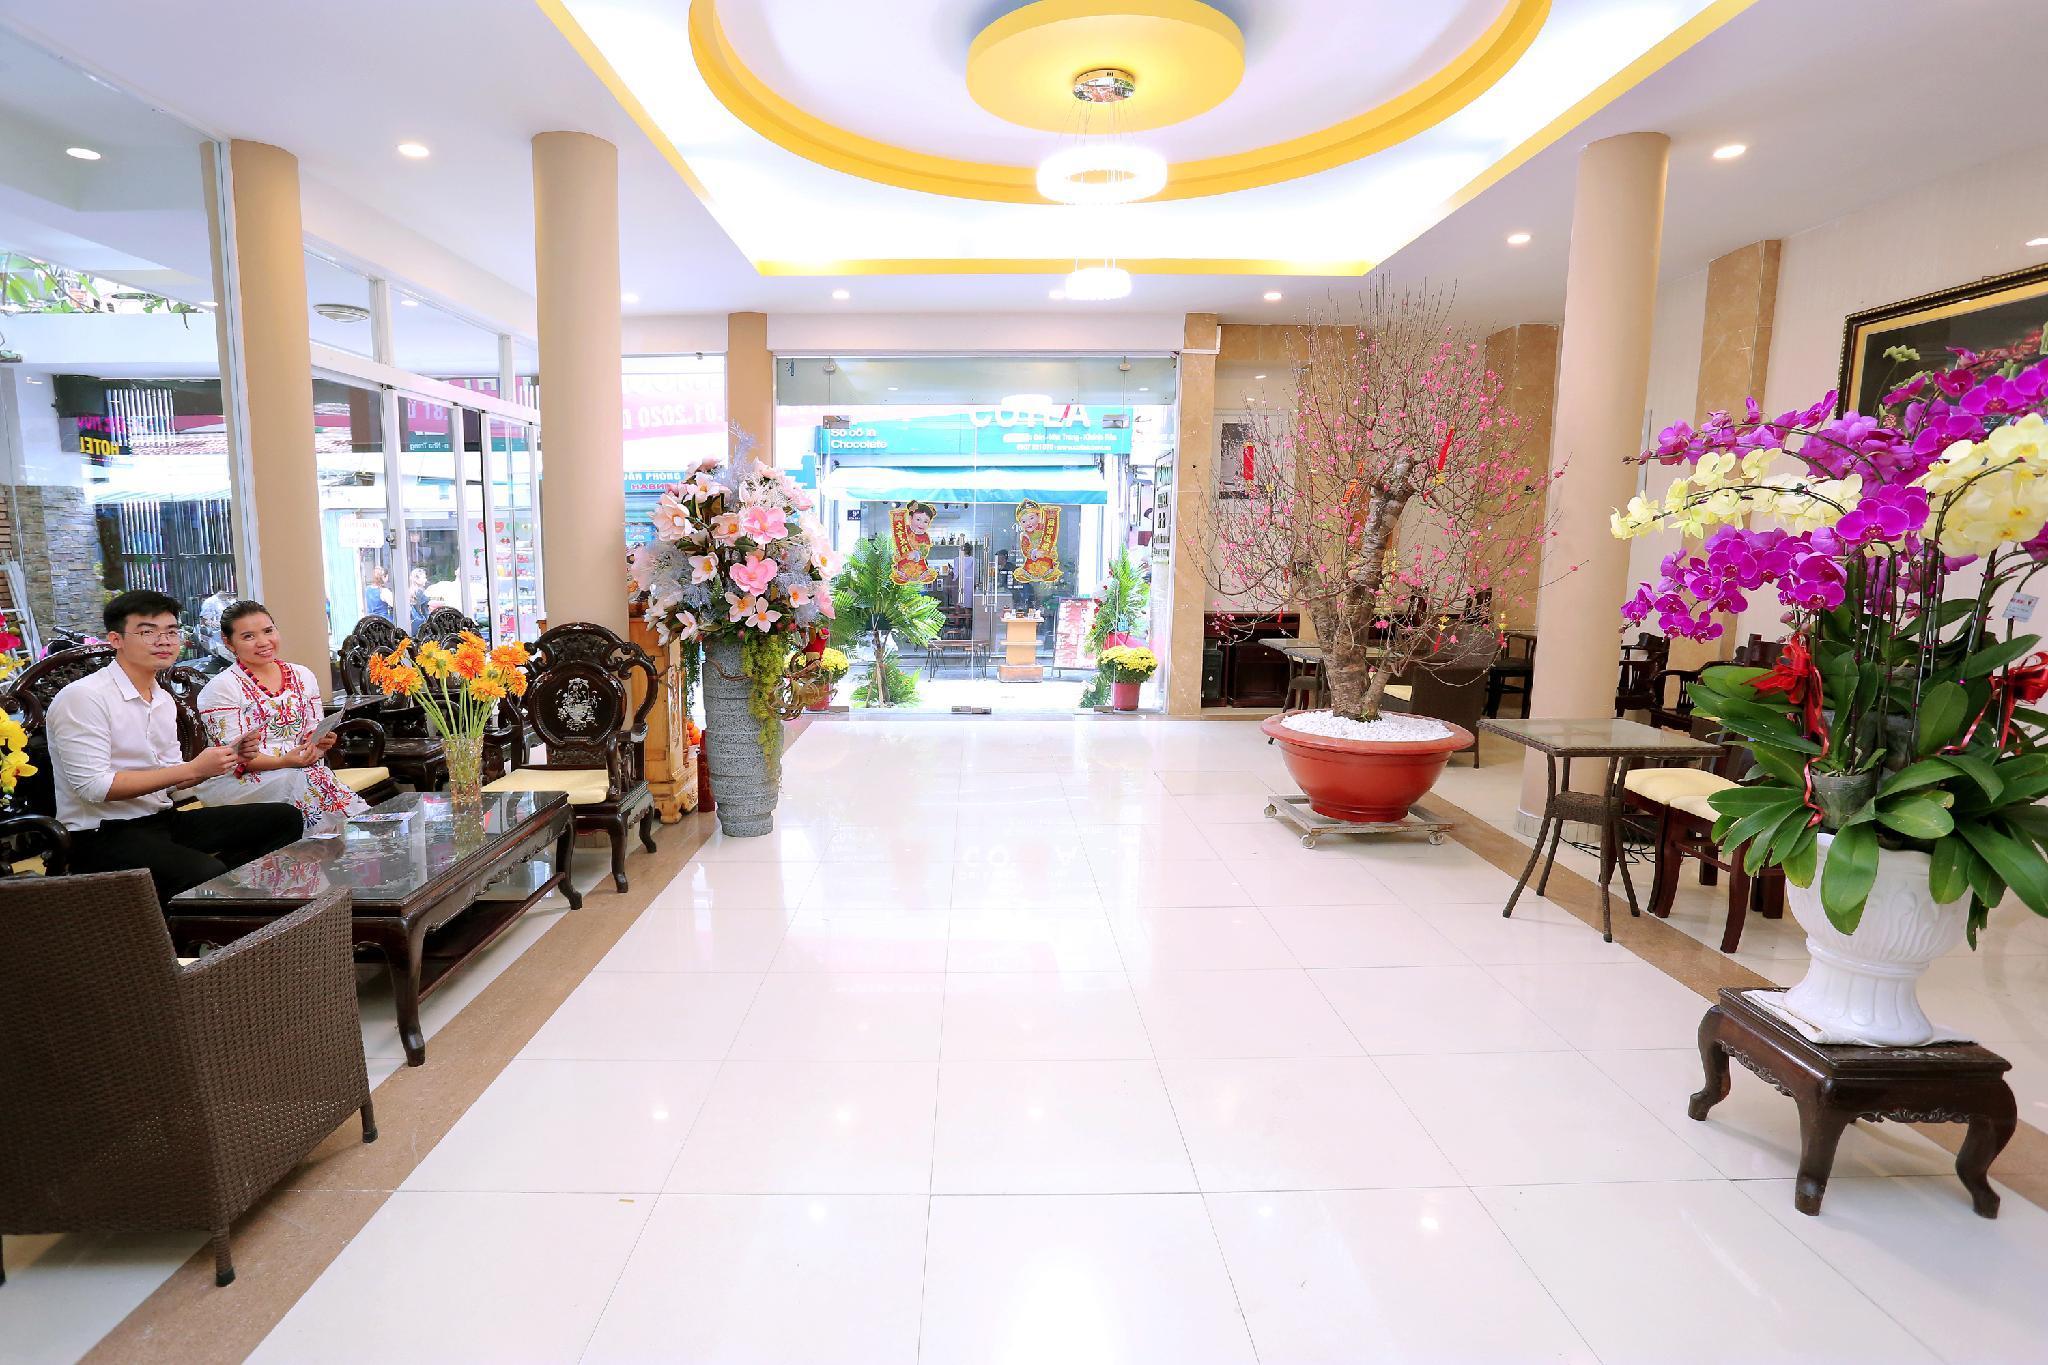 Monaco Hotel Nha Trang, Nha Trang